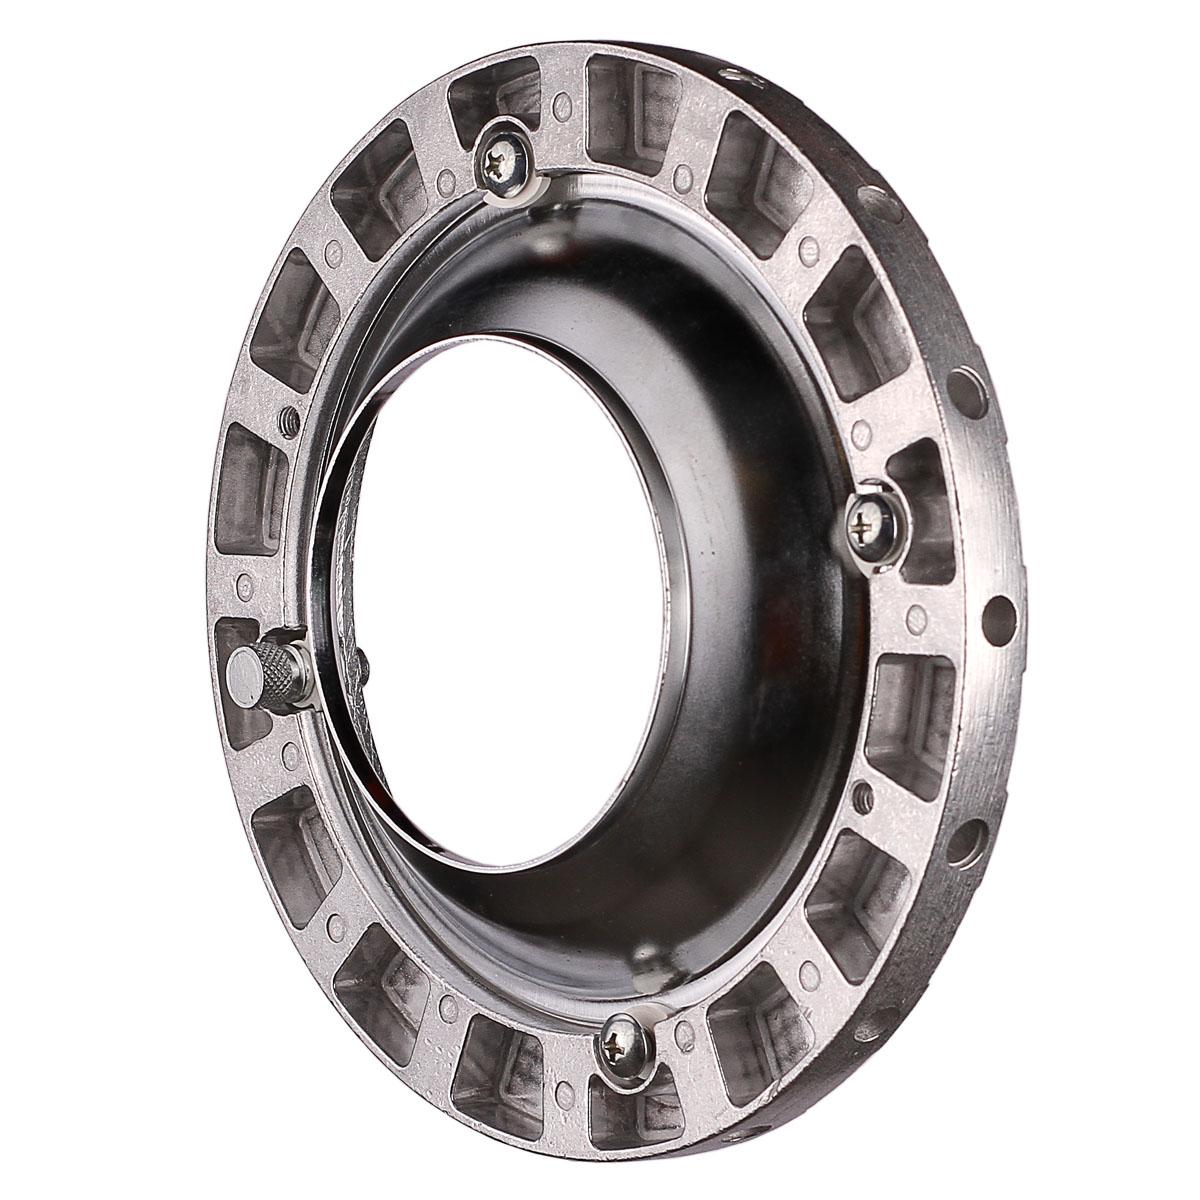 Phottix Speed Ring For Hensel (144mm, 16-Hole)